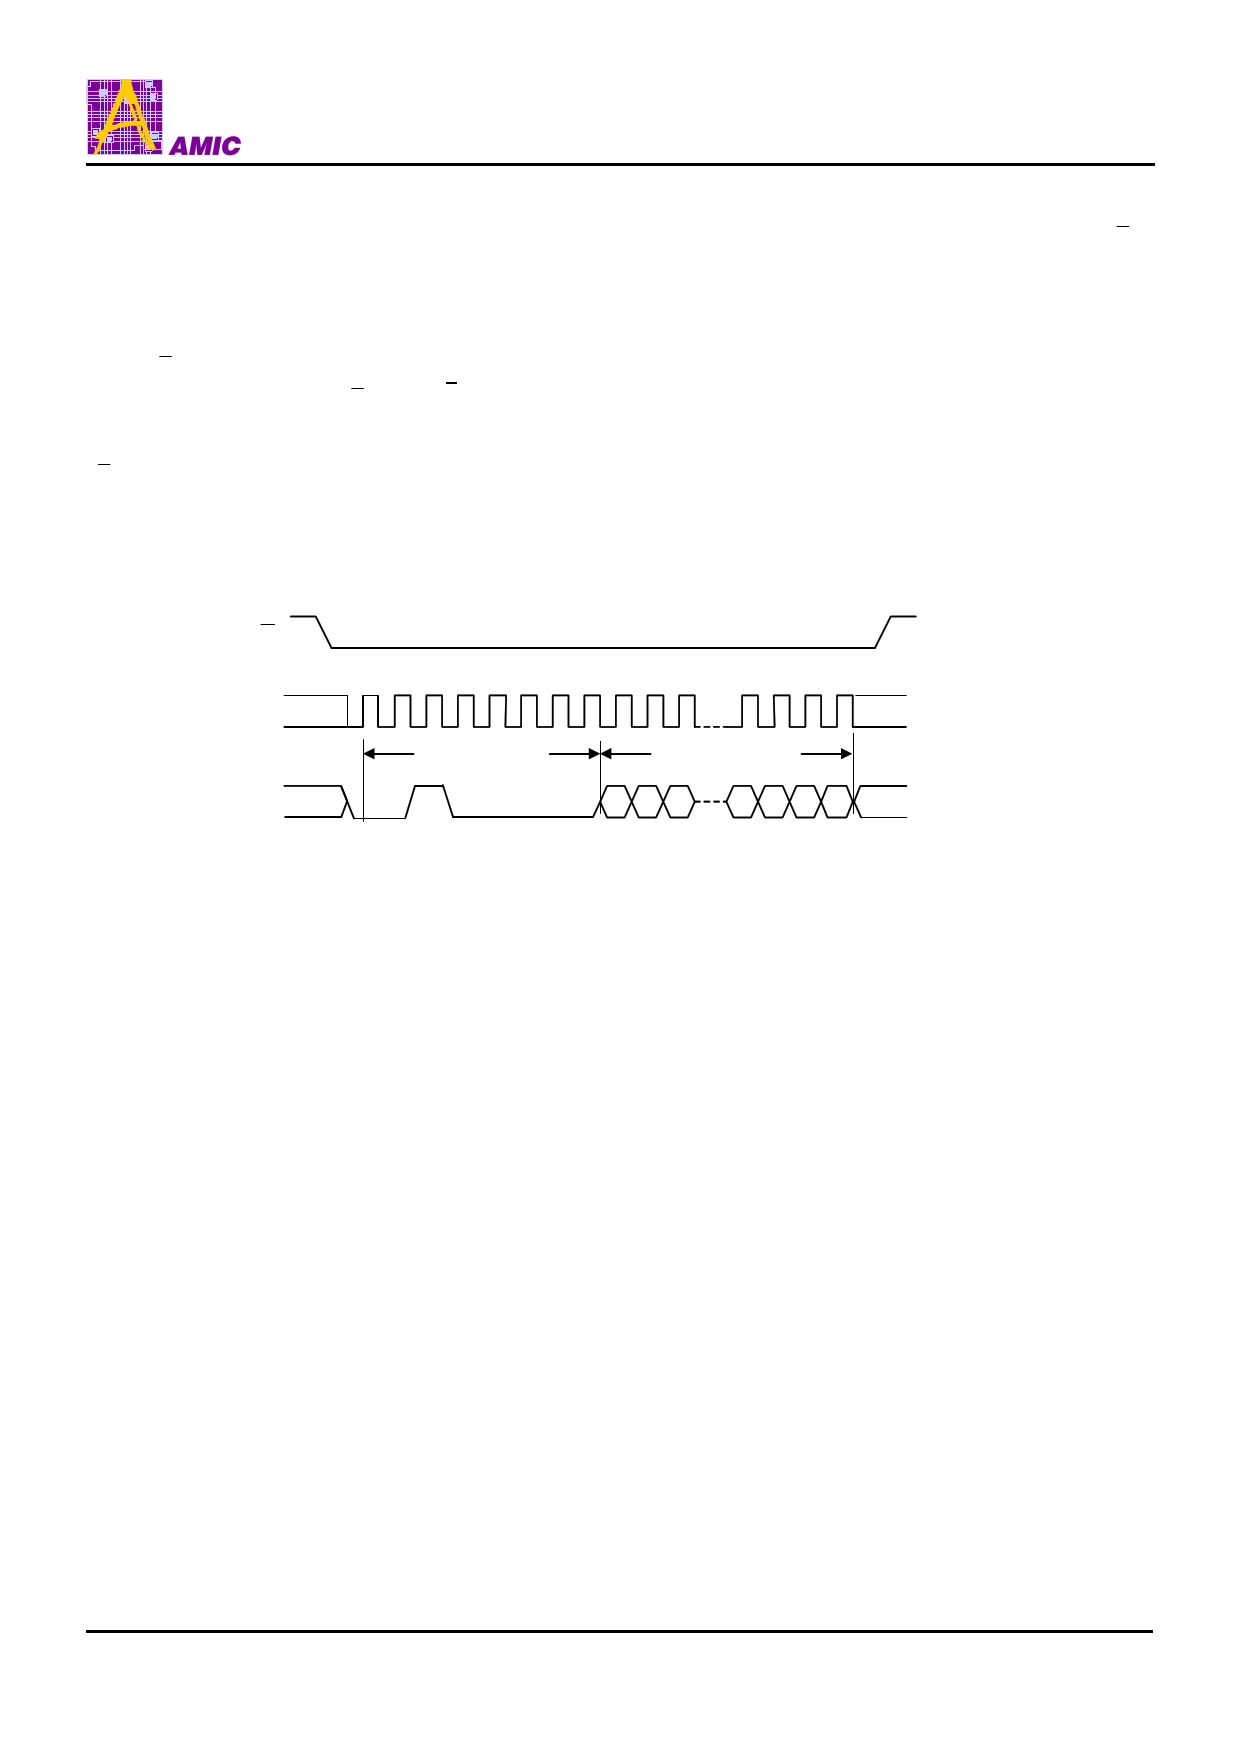 A25P020 transistor, igbt